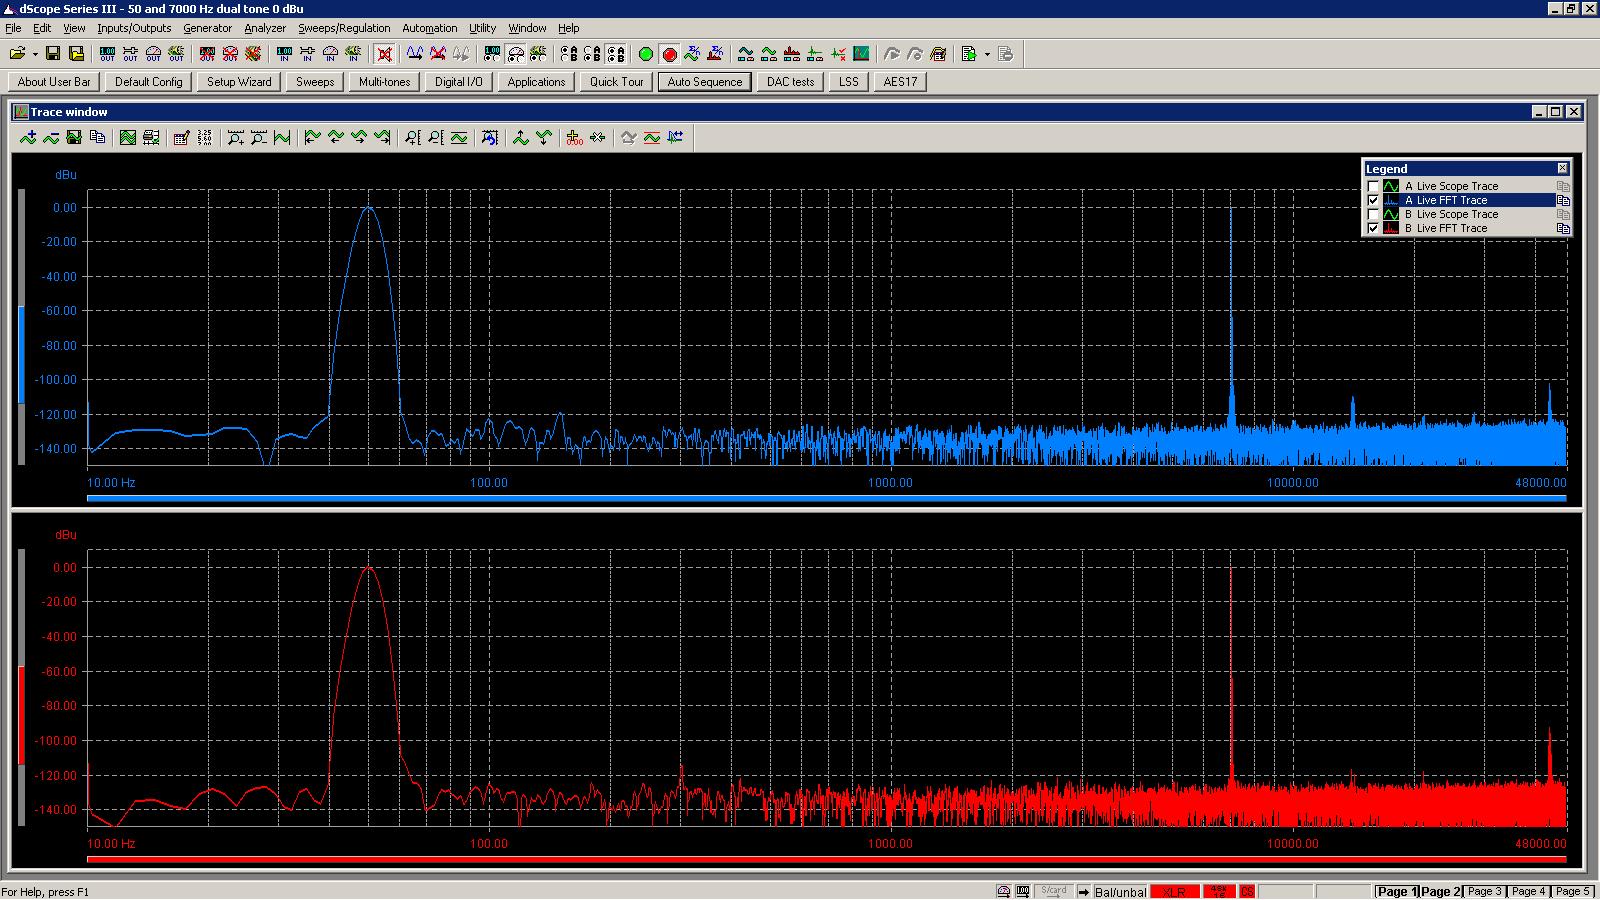 20160905 Jotunheim 50+7000Hz dual tone 0dBu 300R Bal.png